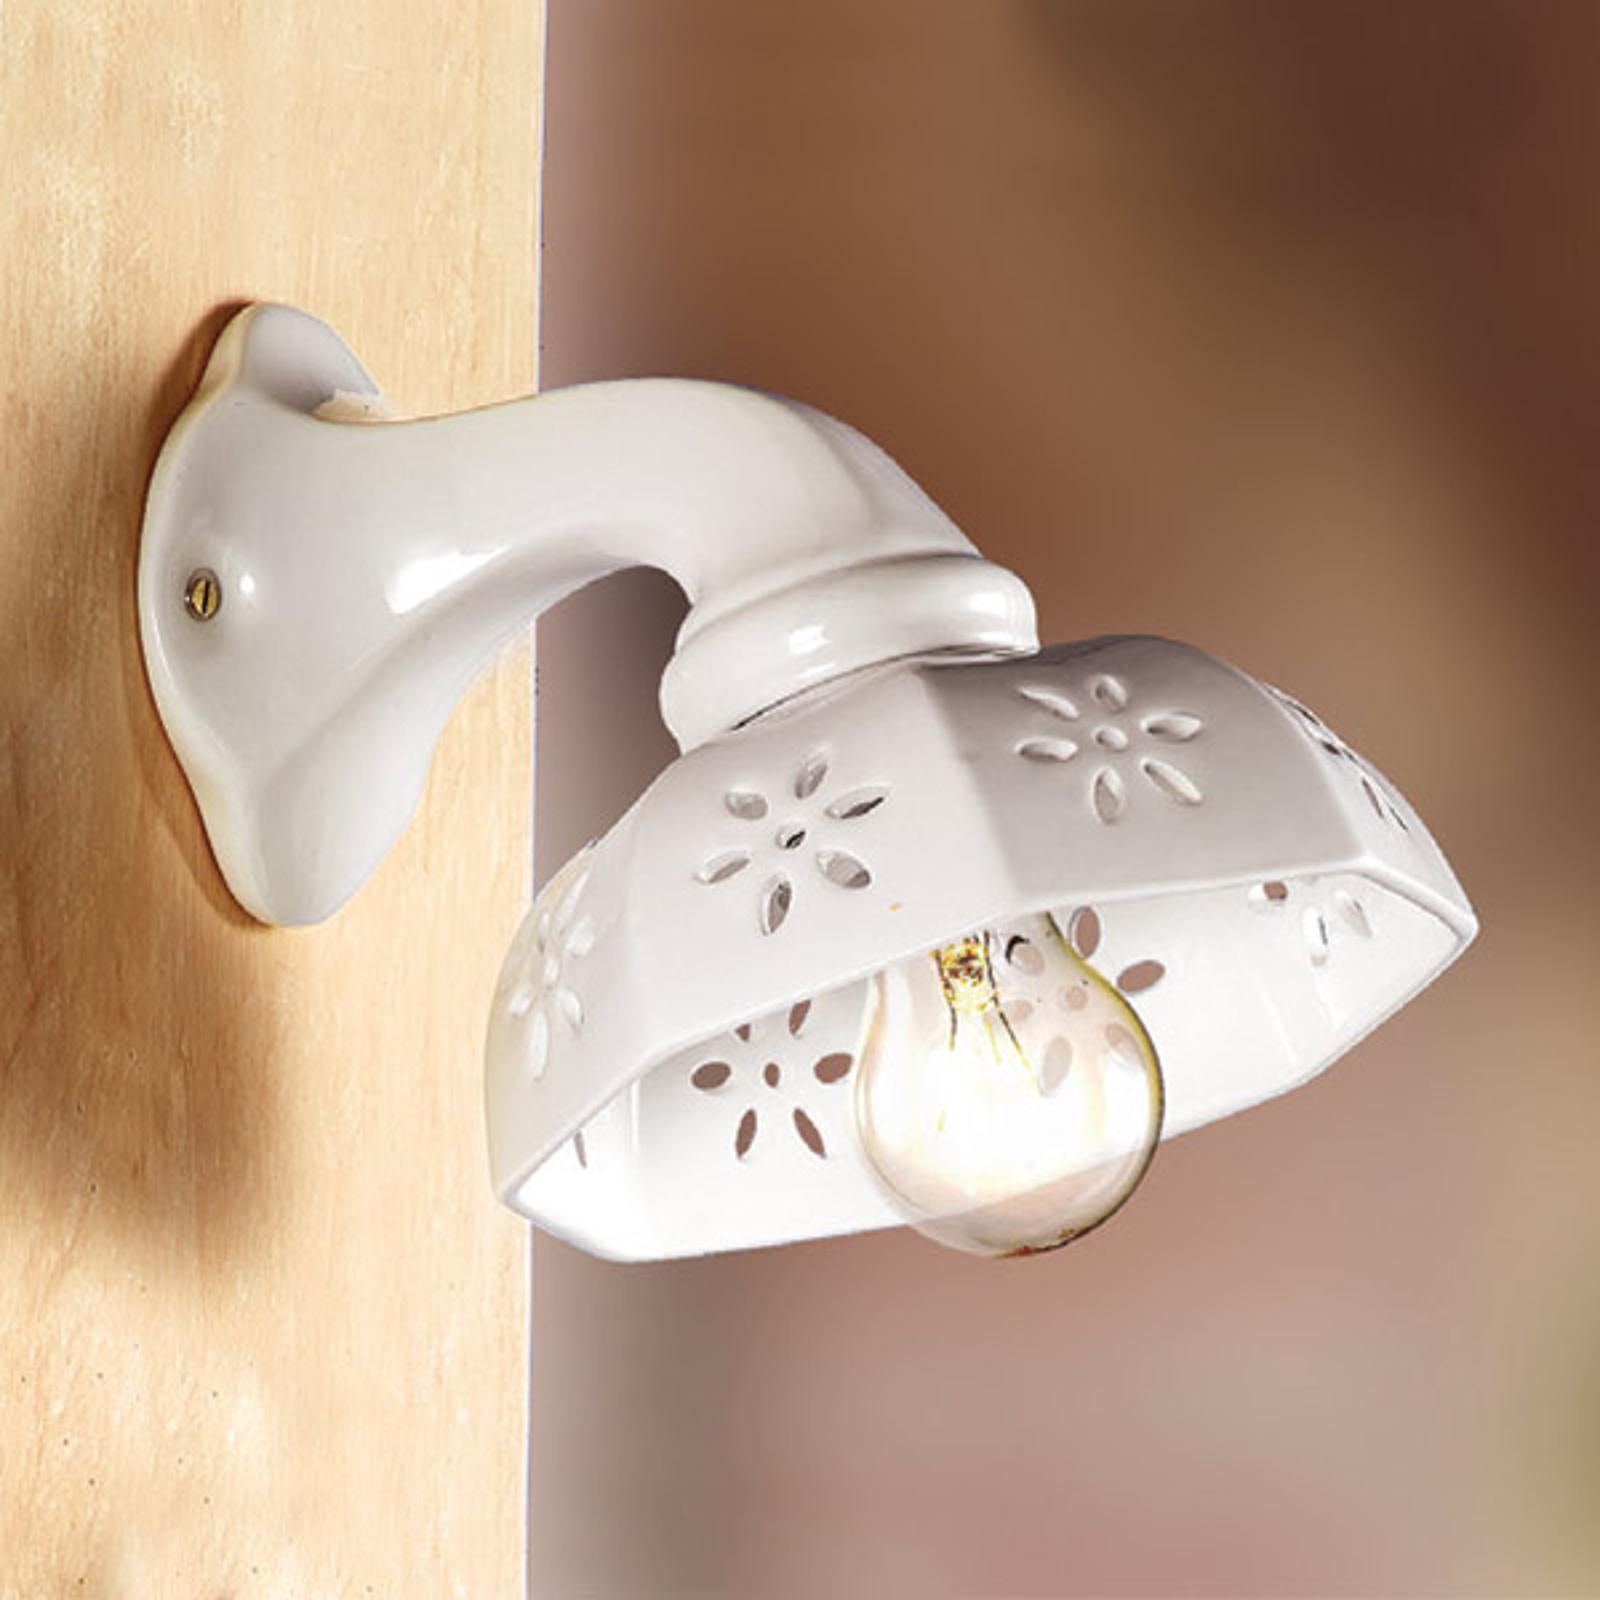 Vit keramik-vägglampa SCODELLINA